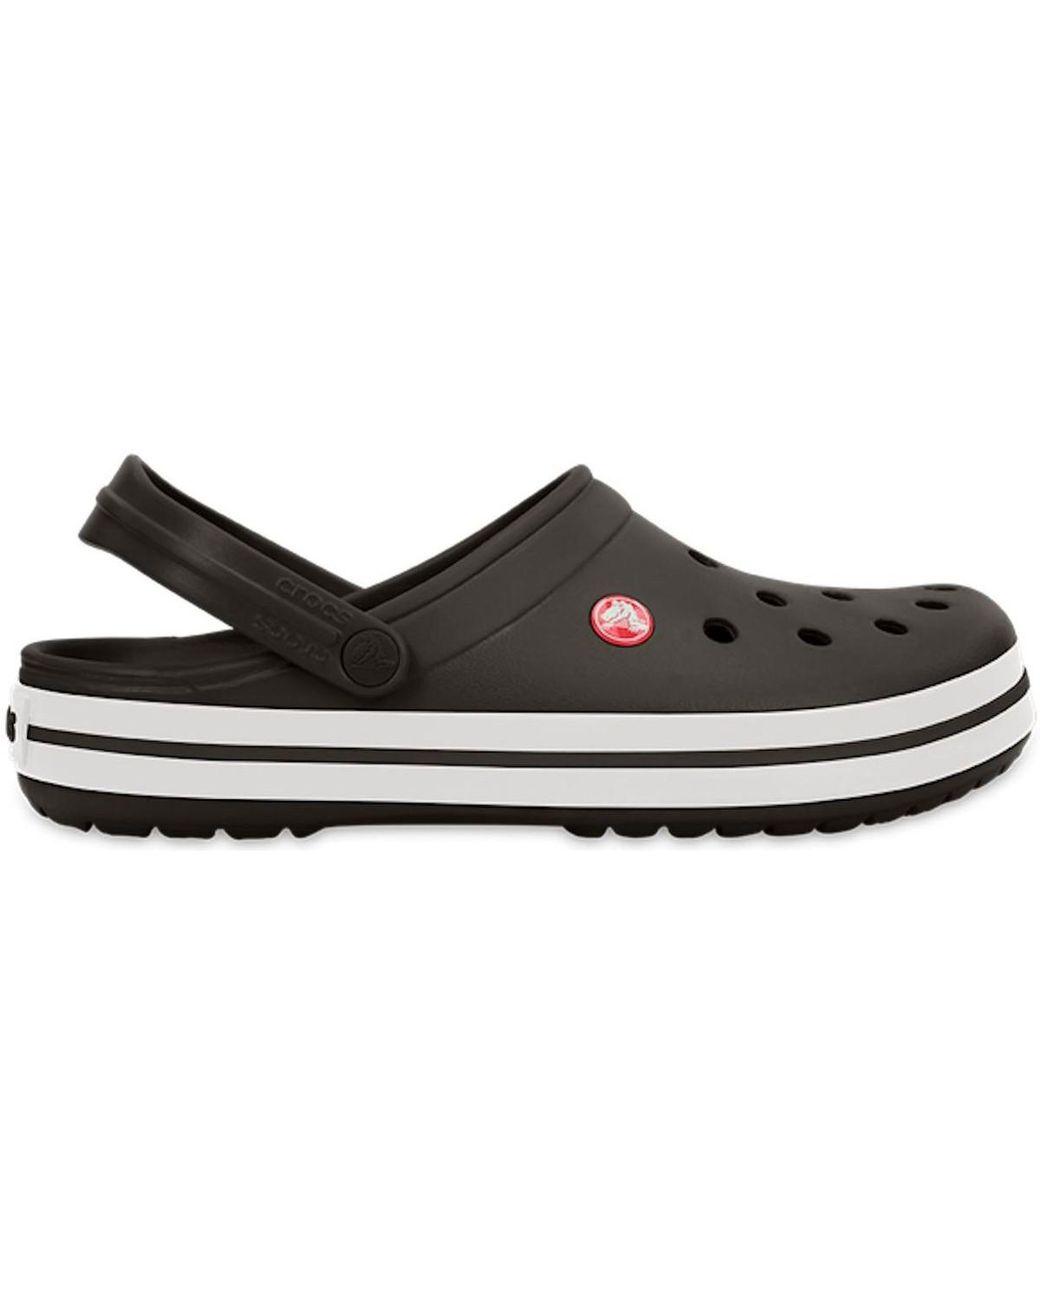 0f725ea910bb Crocs™ Crocband Clogs Shoes Sandals In Black 11016 001 Men s Clogs (shoes)  In Black in Black for Men - Lyst